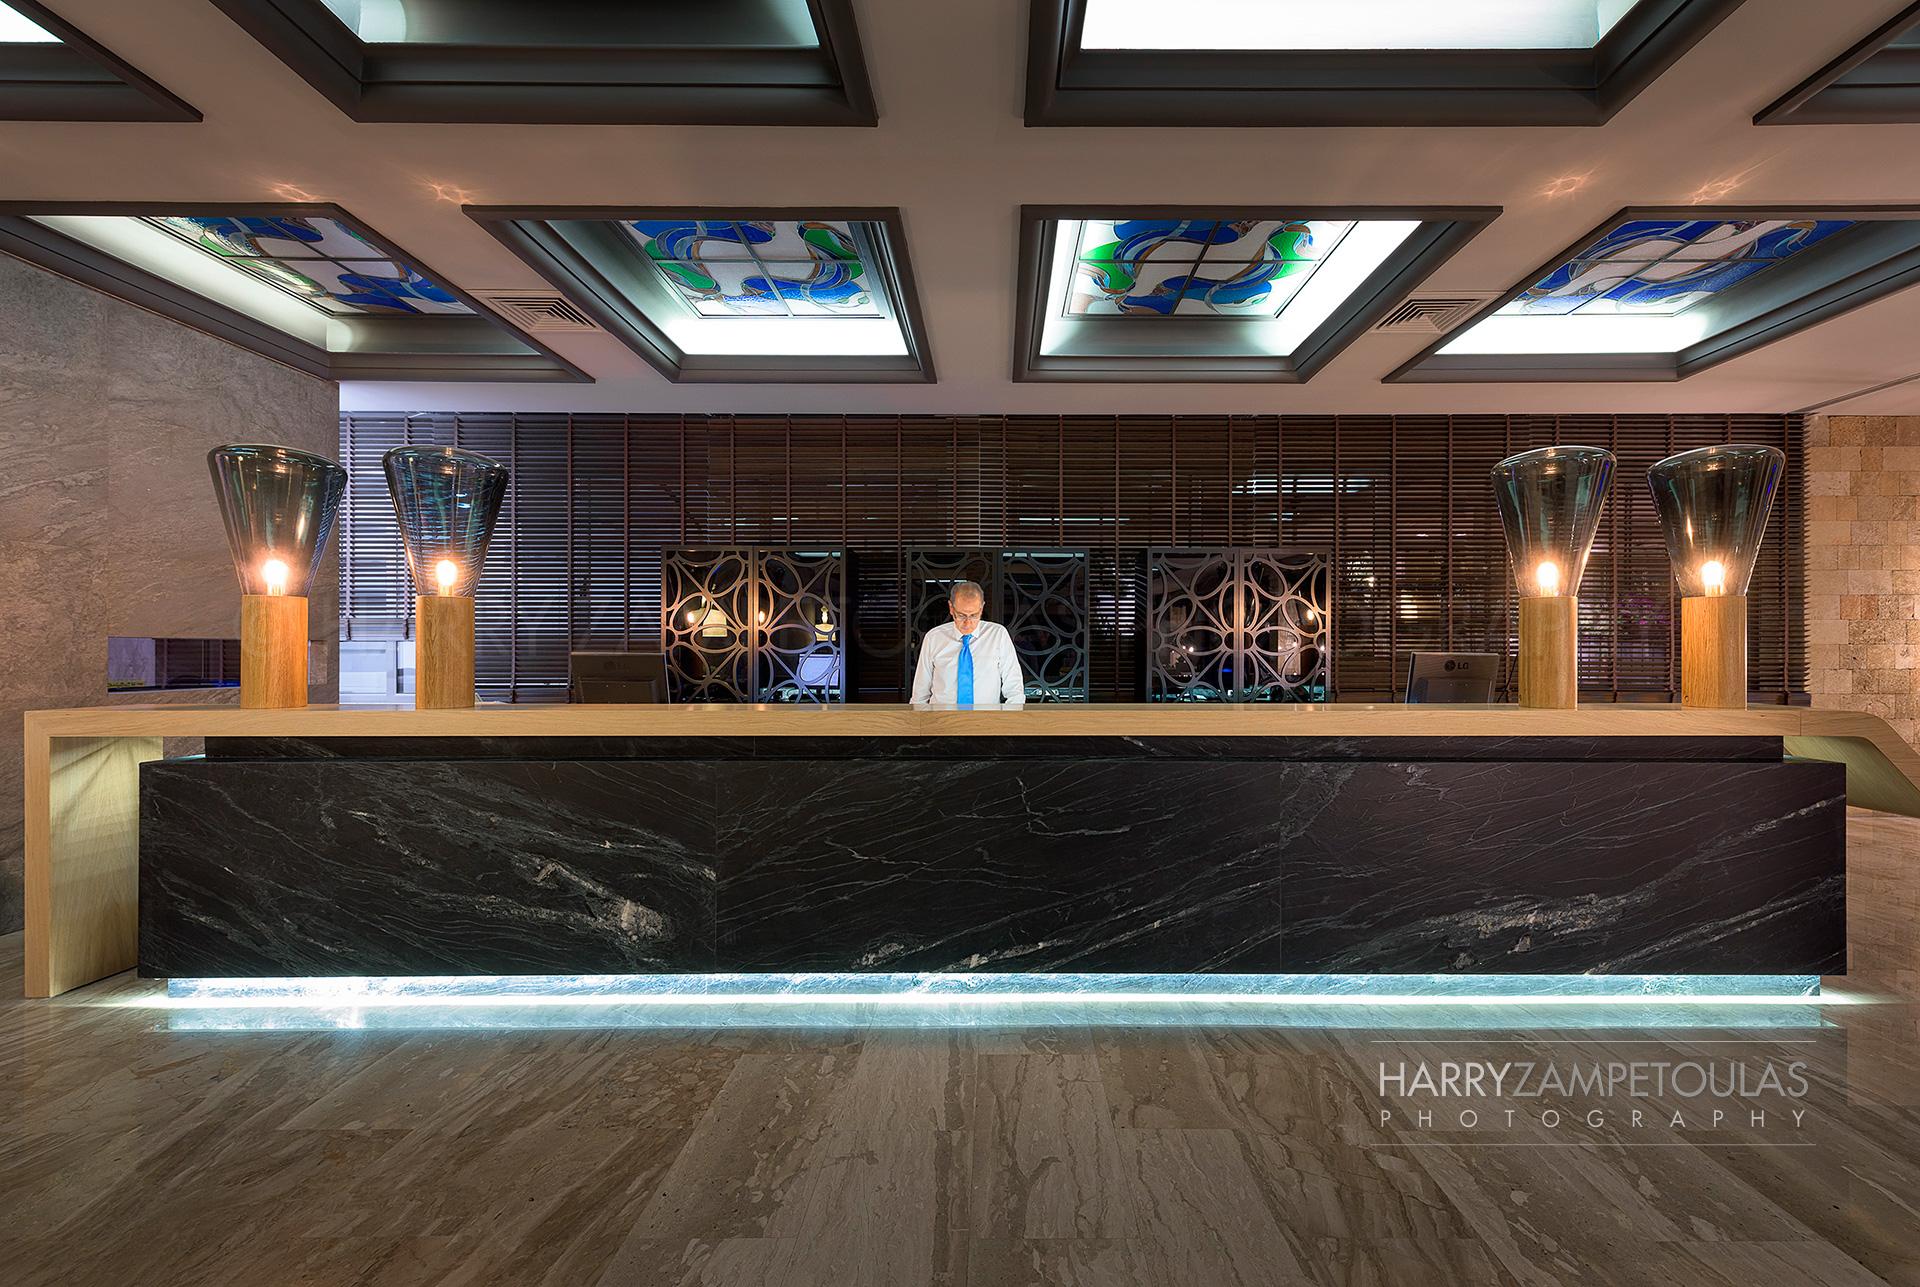 Porto Angeli Hotel, Rhodes 2016 - Hotel Photography by Harry Zampetoulas, Rhodes